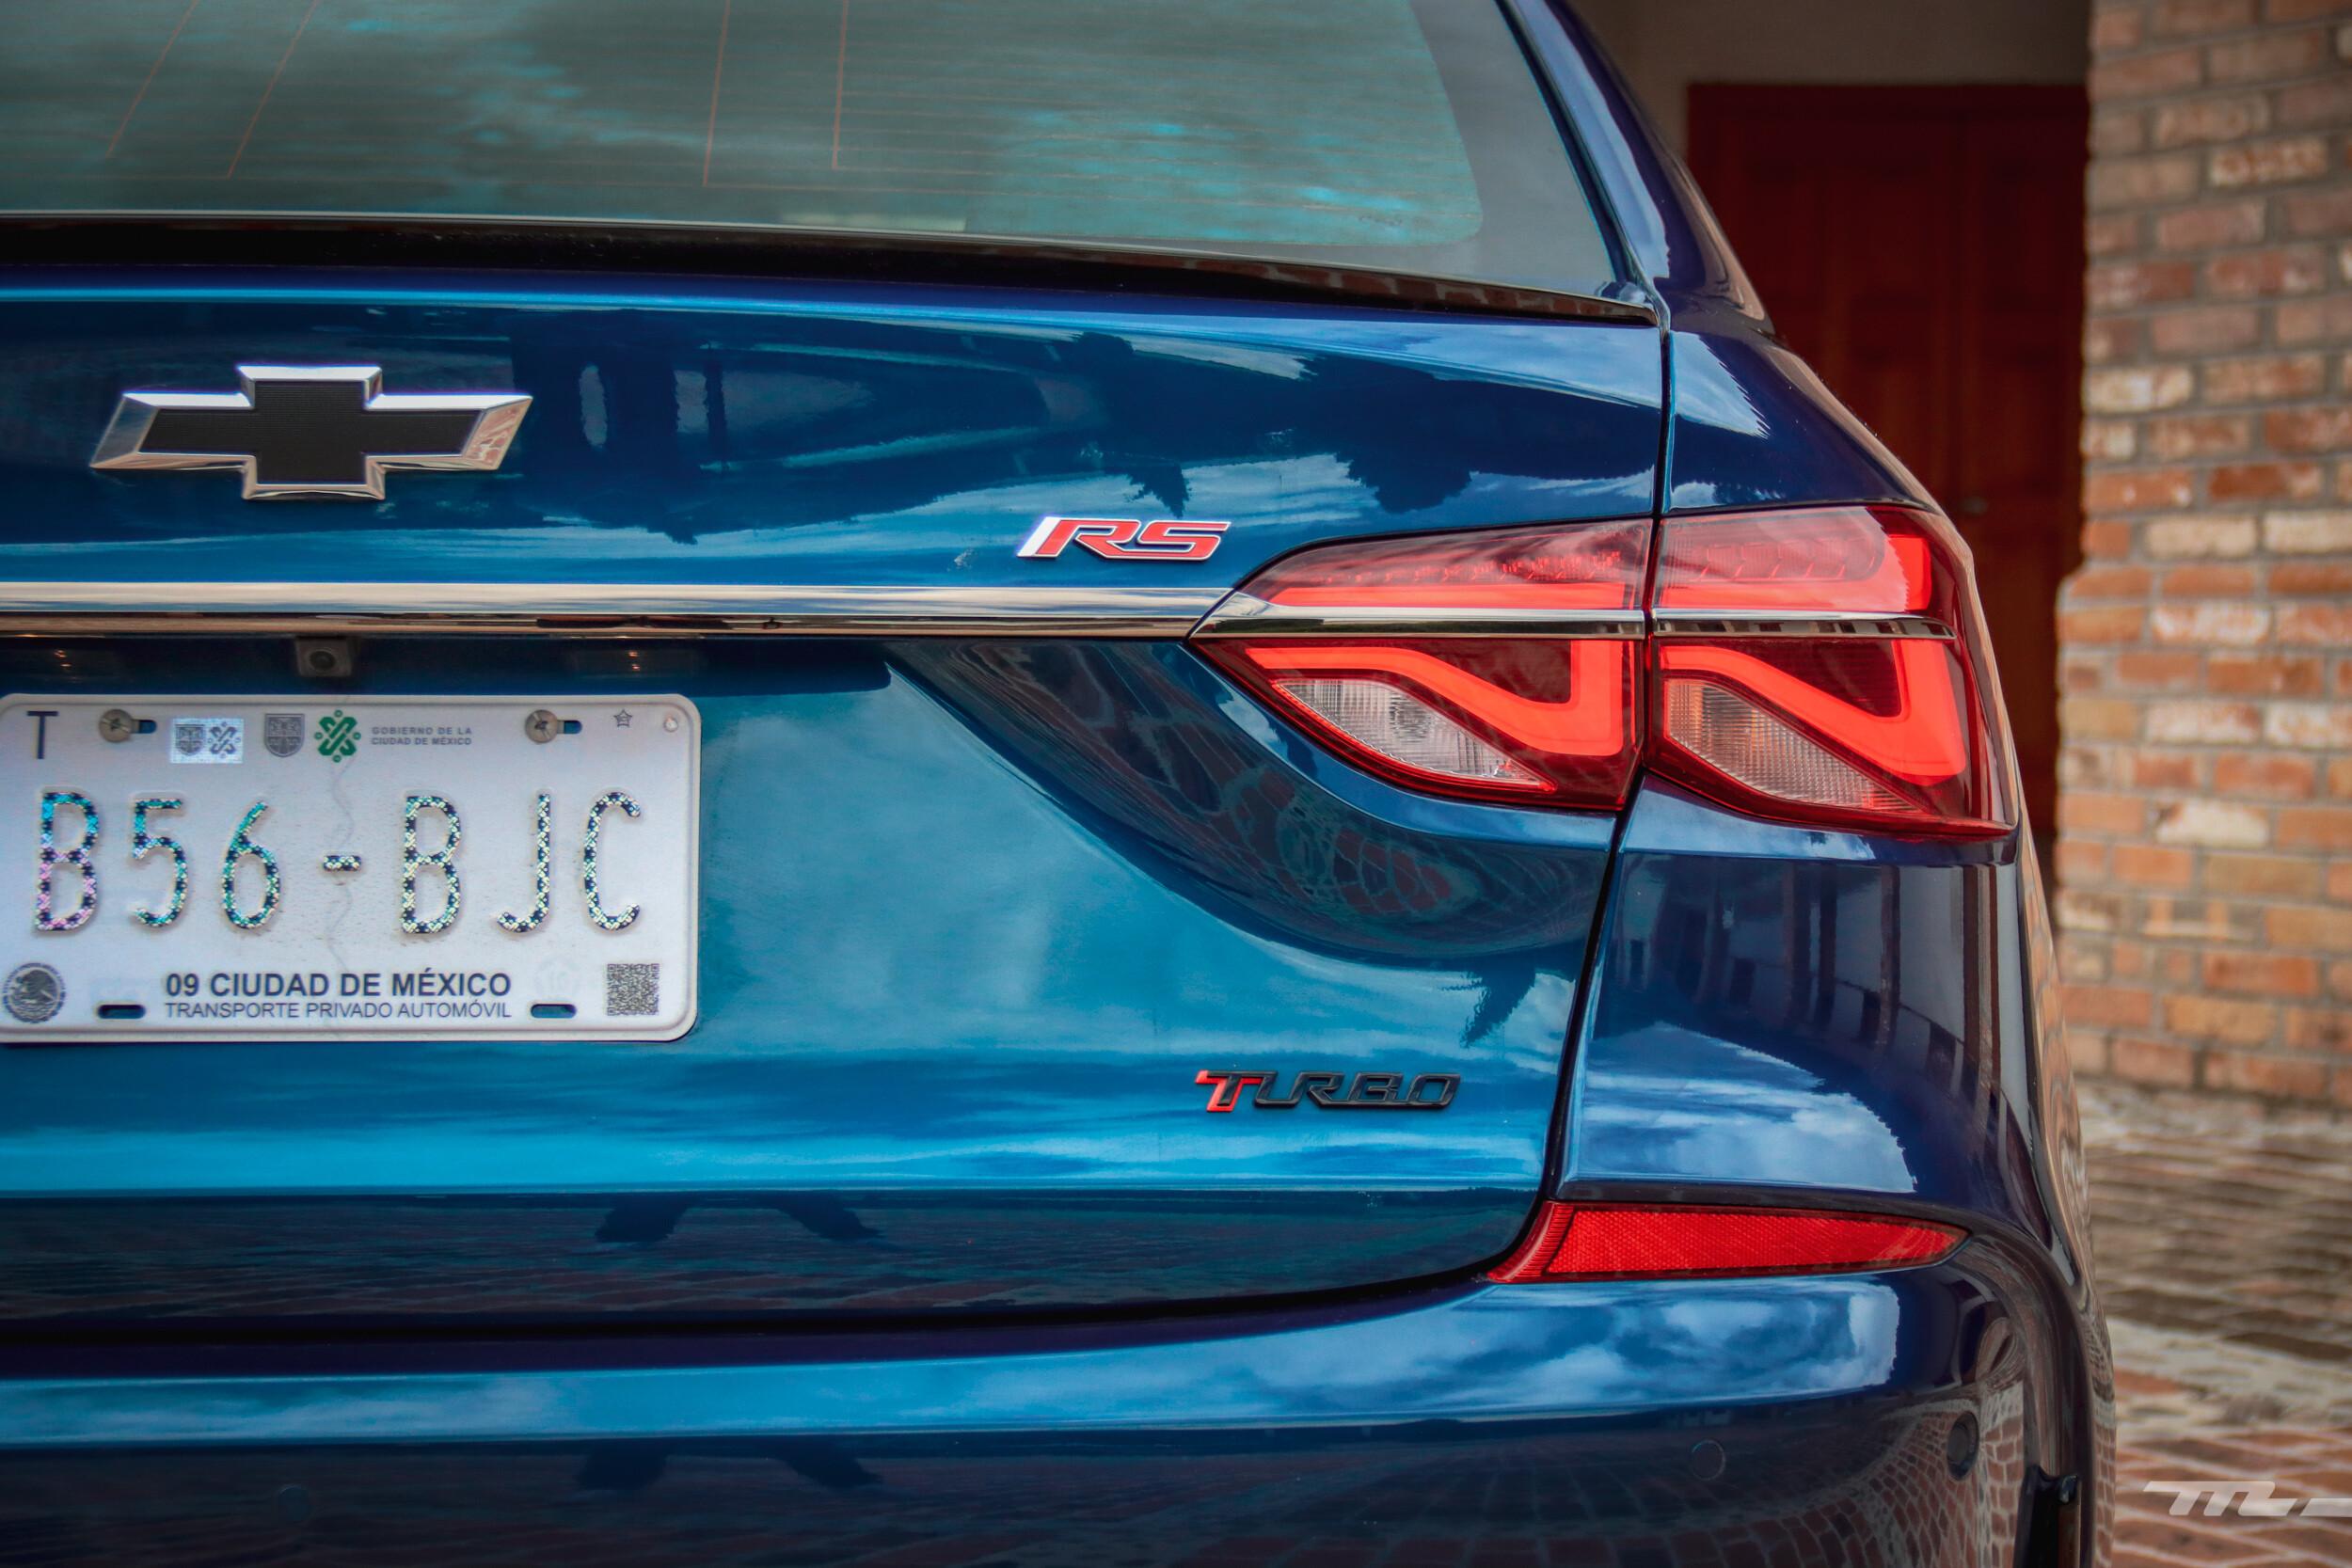 Foto de Chevrolet Cavalier Turbo 2022: Primer vistazo (35/37)